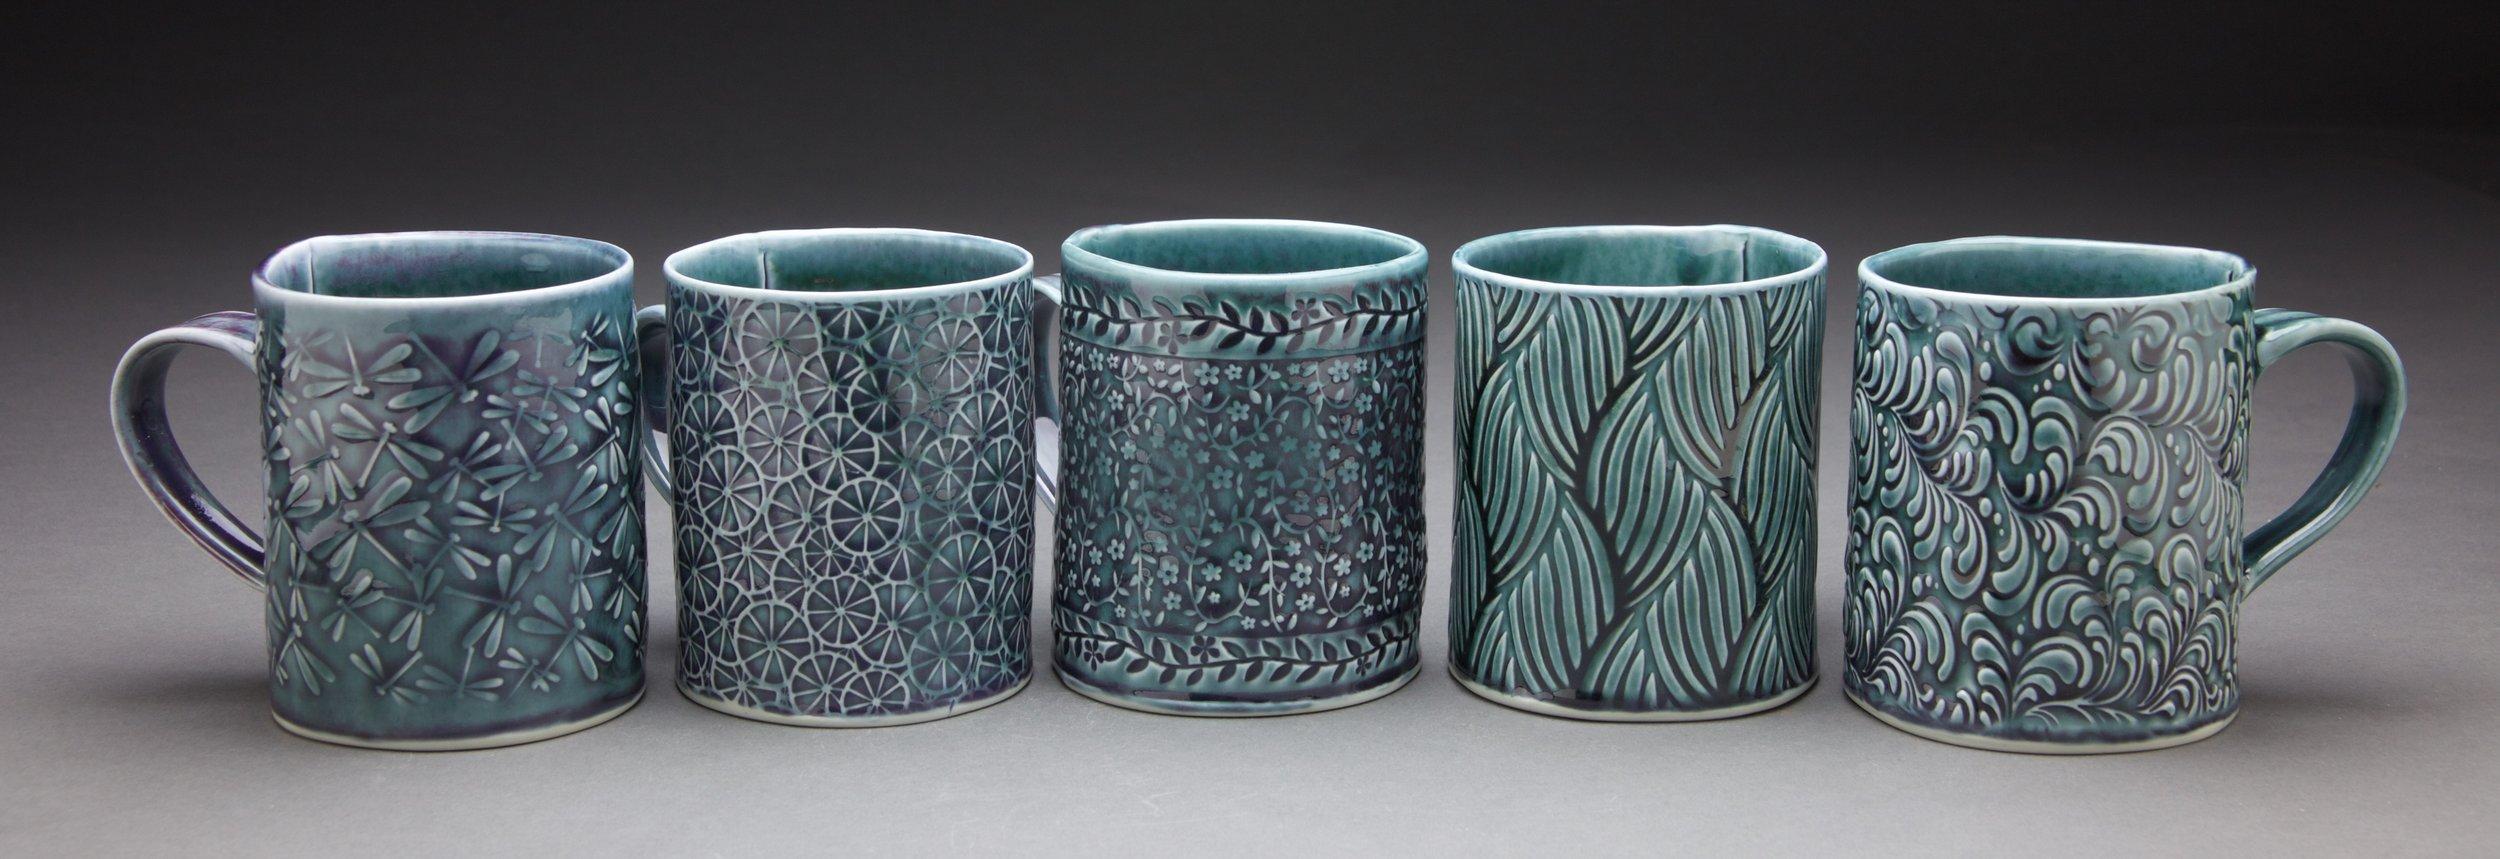 16 oz. mugs 3.5x3.5x4 in. Persian Blue glaze